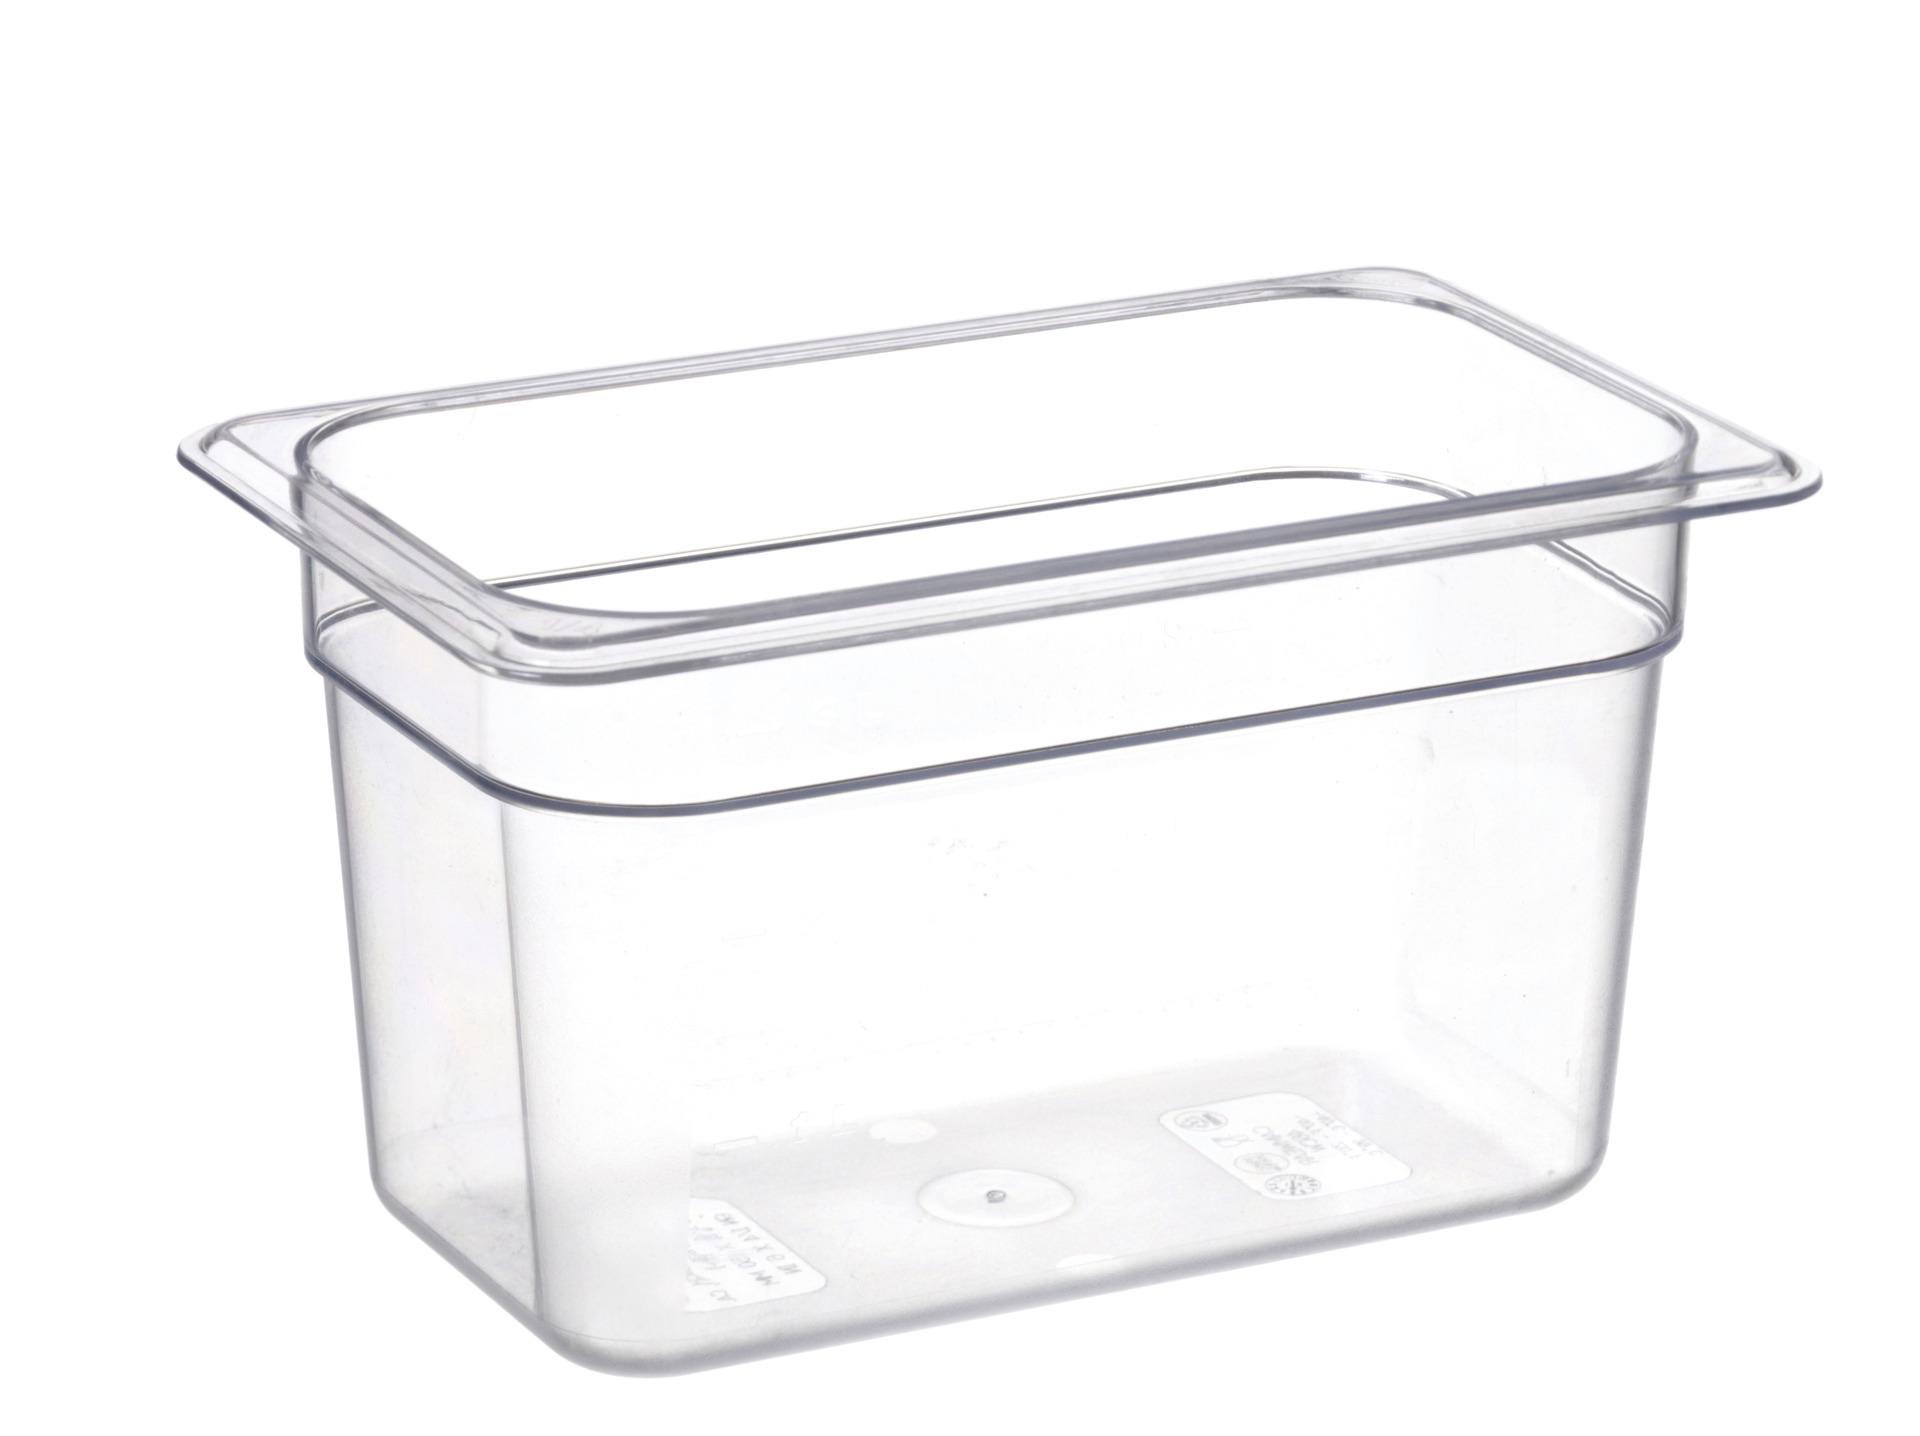 GN-Behälter GN 1/4 265 x 162 x 150 mm Polycarbonat transparent